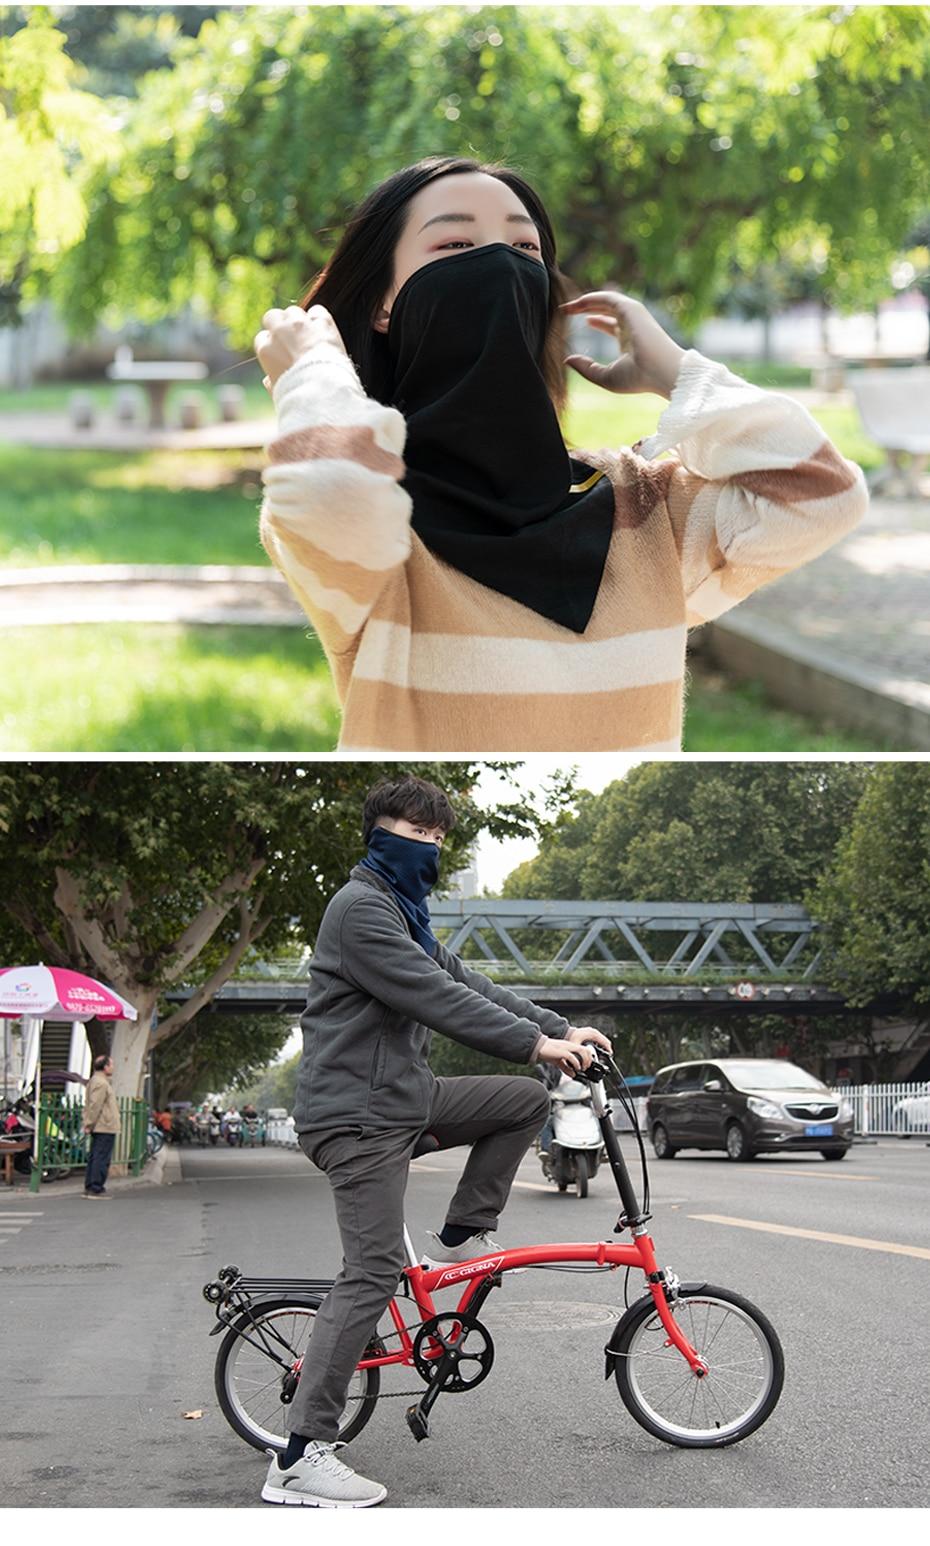 HTB1XPZLXN rK1RkHFqDq6yJAFXaP CoolChange Bicycle Mask Winter Warm Face Mask Elastic Cycling Triangle Mask Polar Fleece Breathable Ear Protector Bike Facemask